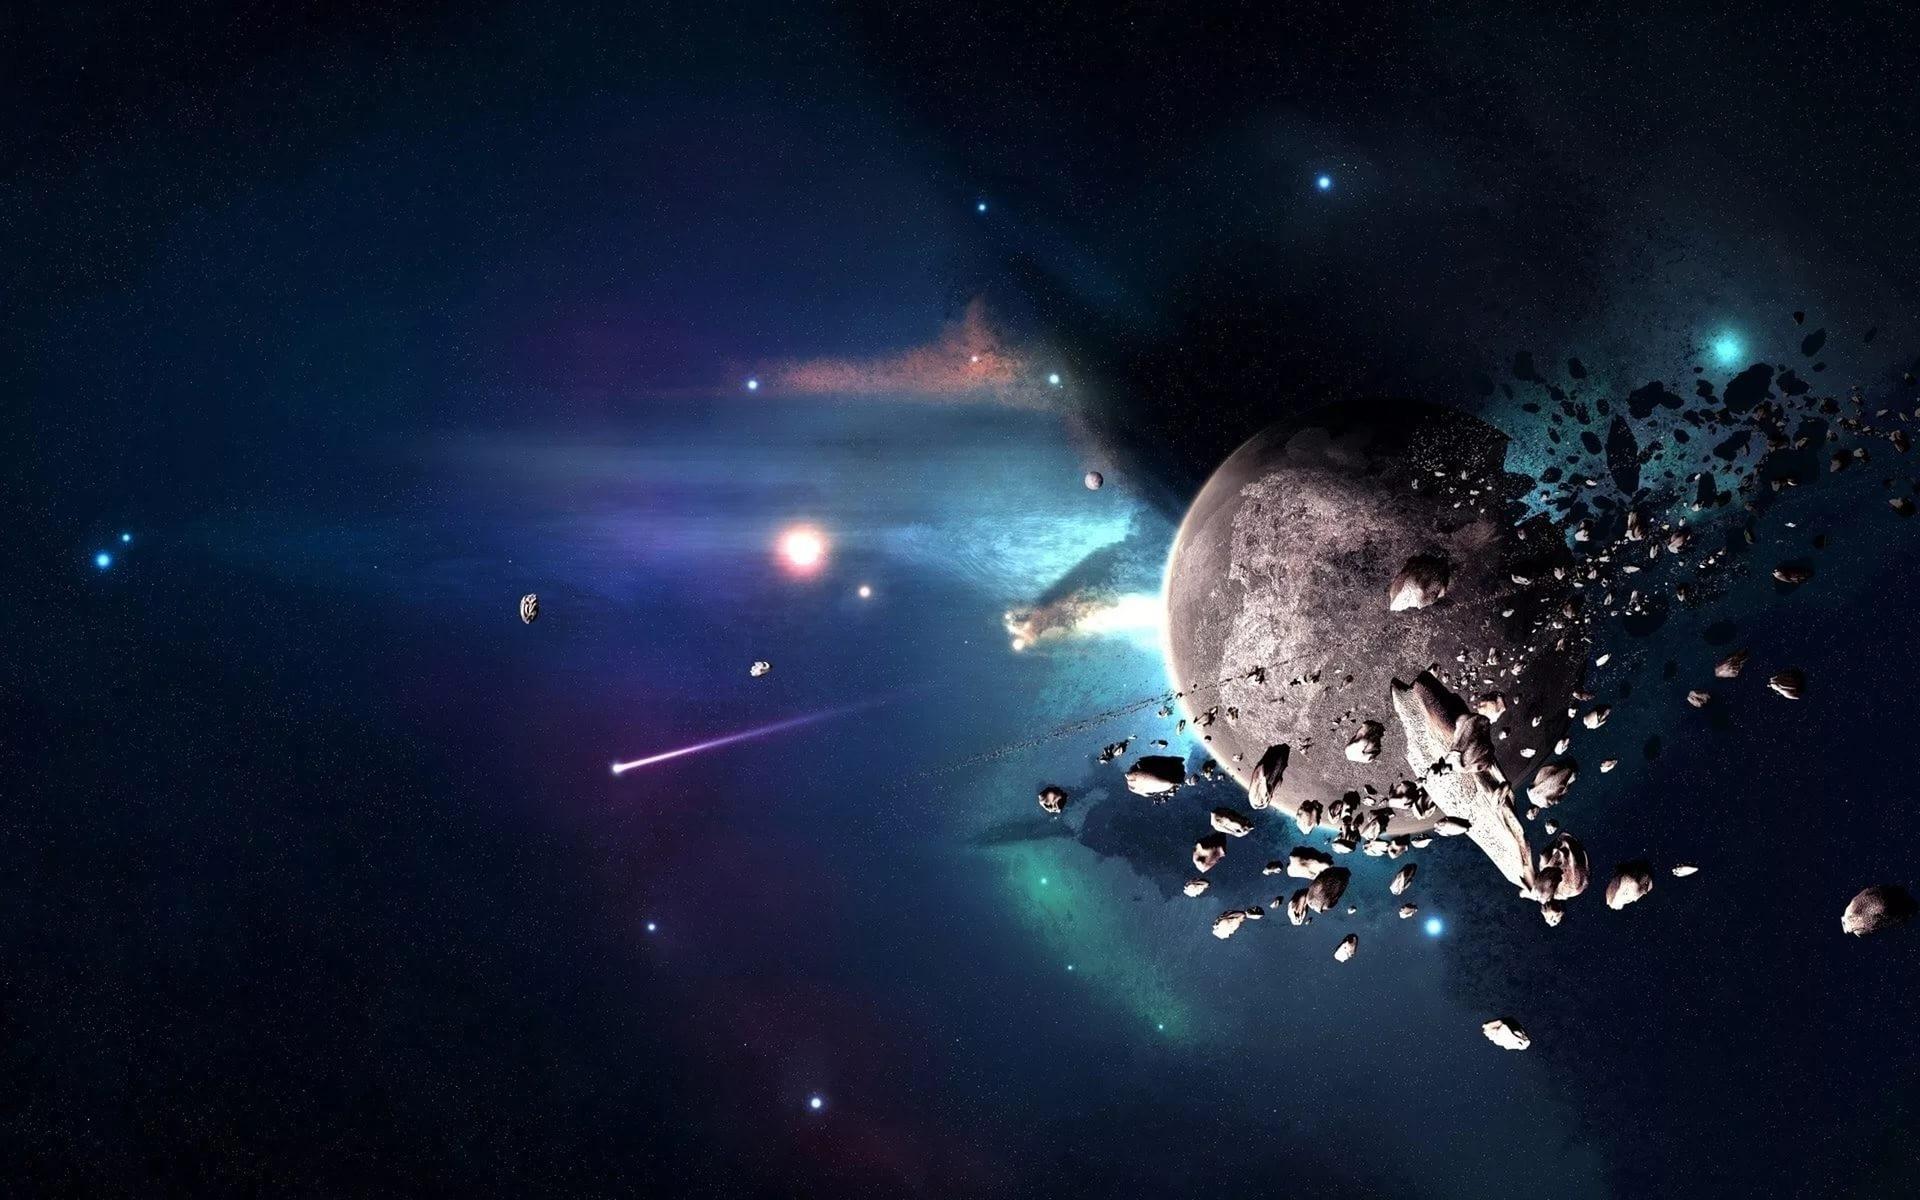 Во время трансляции с модуля Купол в объектив попали два НЛО